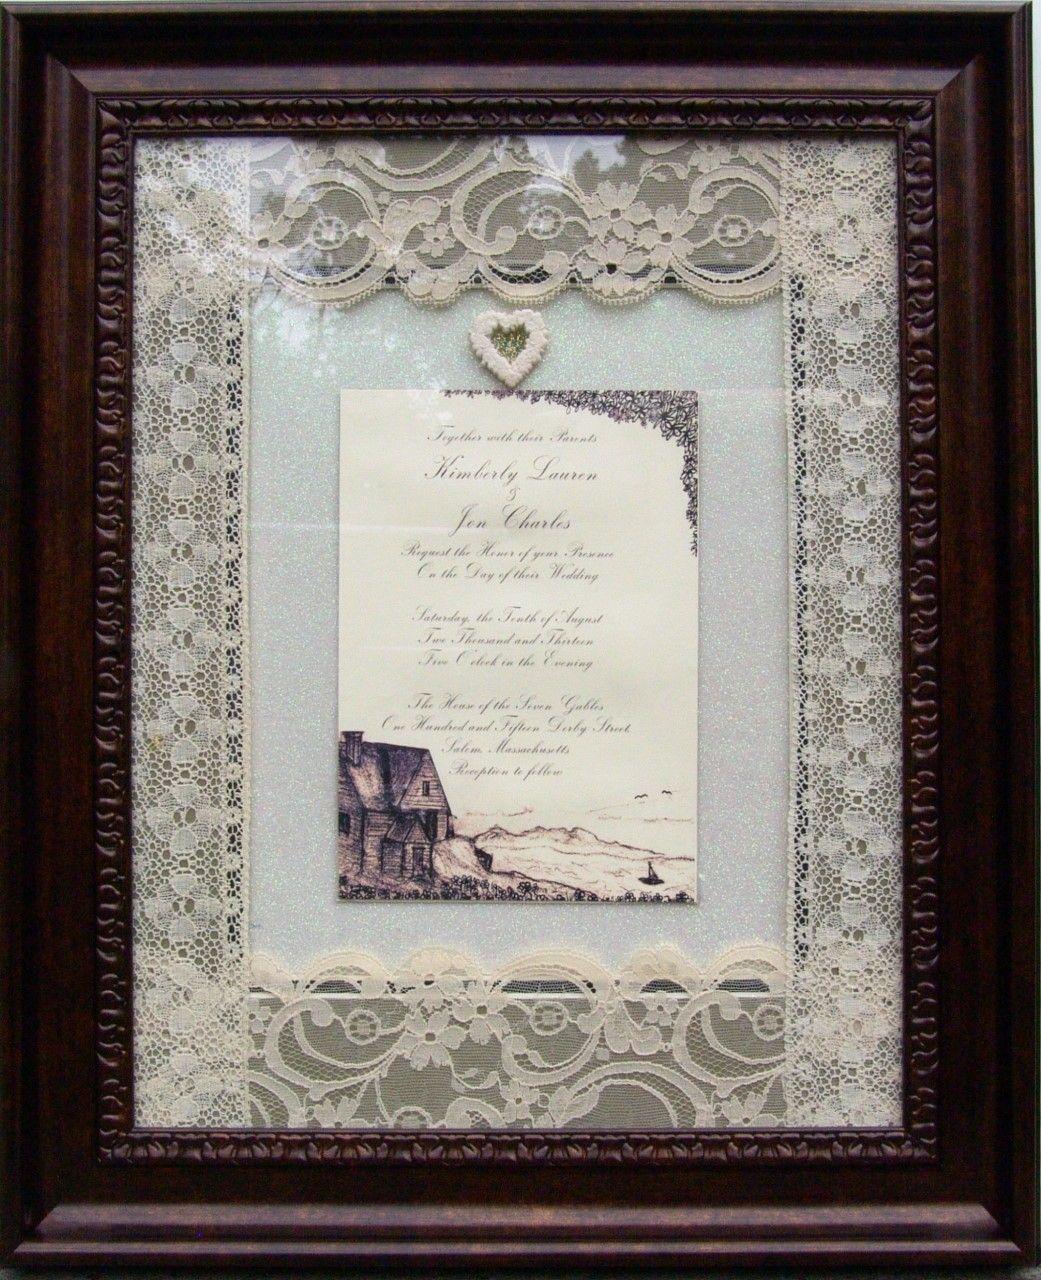 Custom Made & Framed Personalized Wedding Invitation Preservation ...